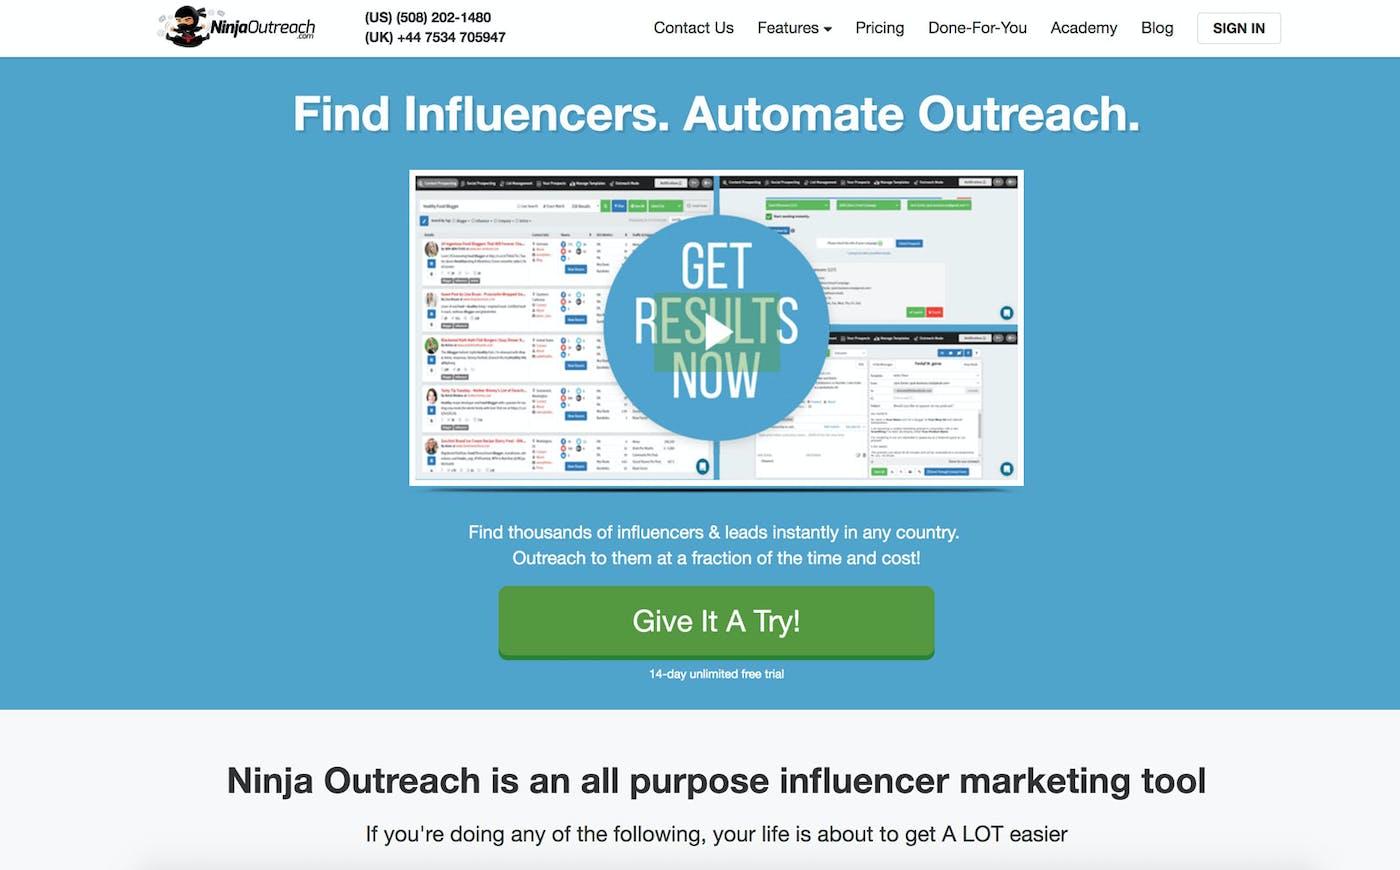 Ninja Outreach ابزاری است برای یافتن تأثیرگذار |  5 ابزار برتر بازاریابی آنفلوآنزا برای تبلیغ محتوا